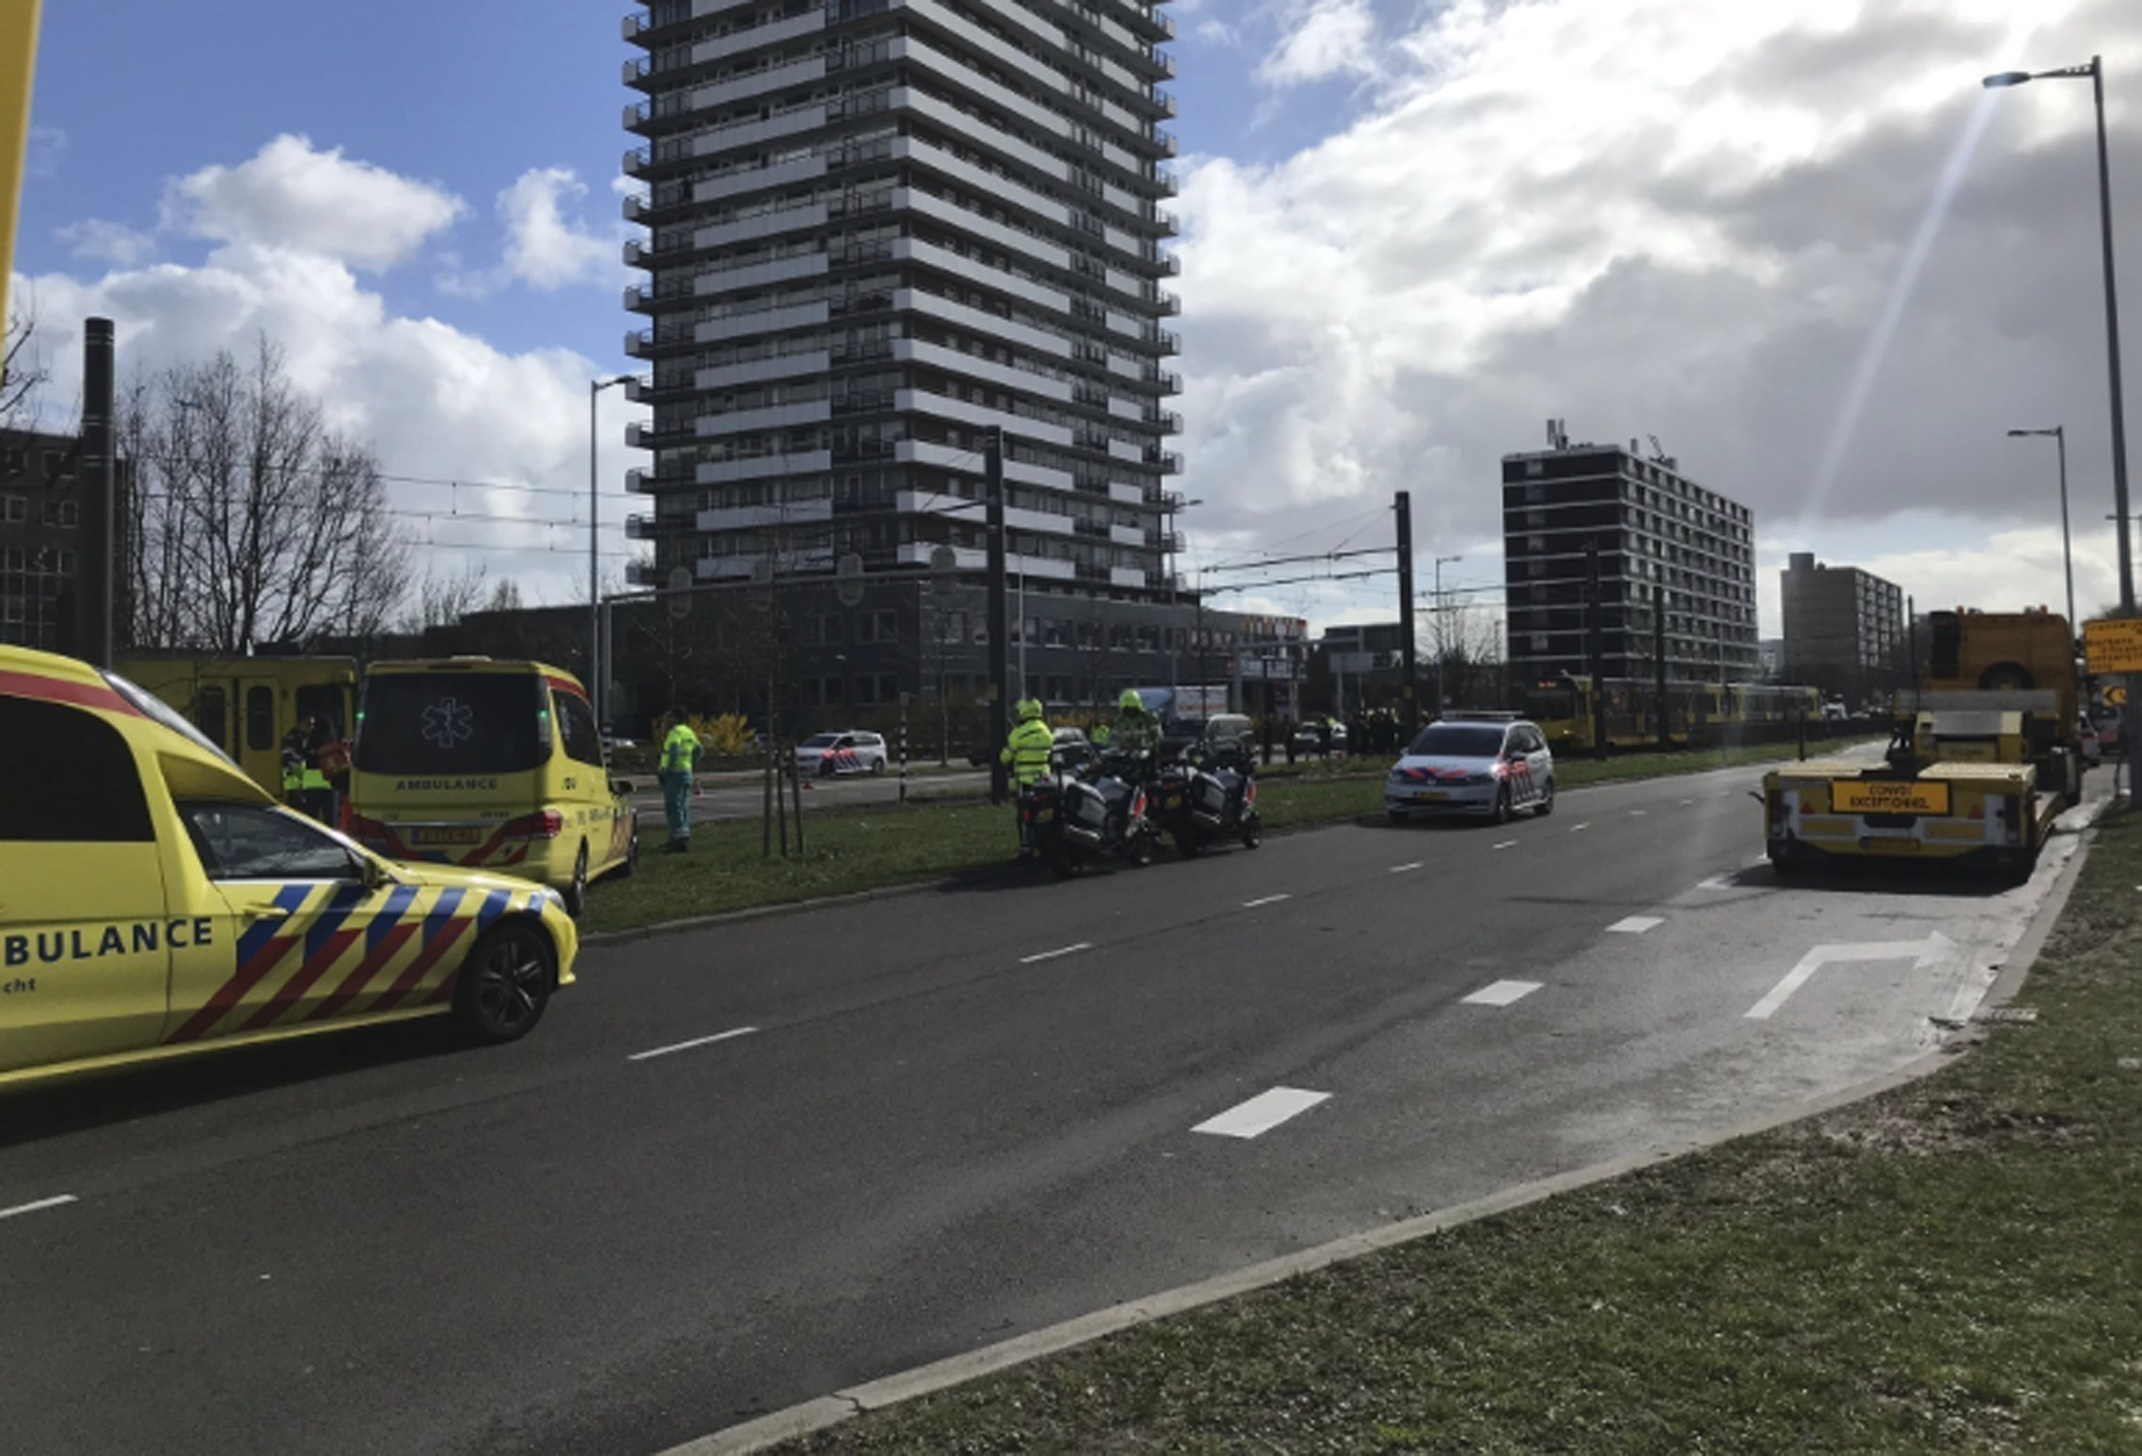 Dutch police considering 'terrorist motive' in tram shooting